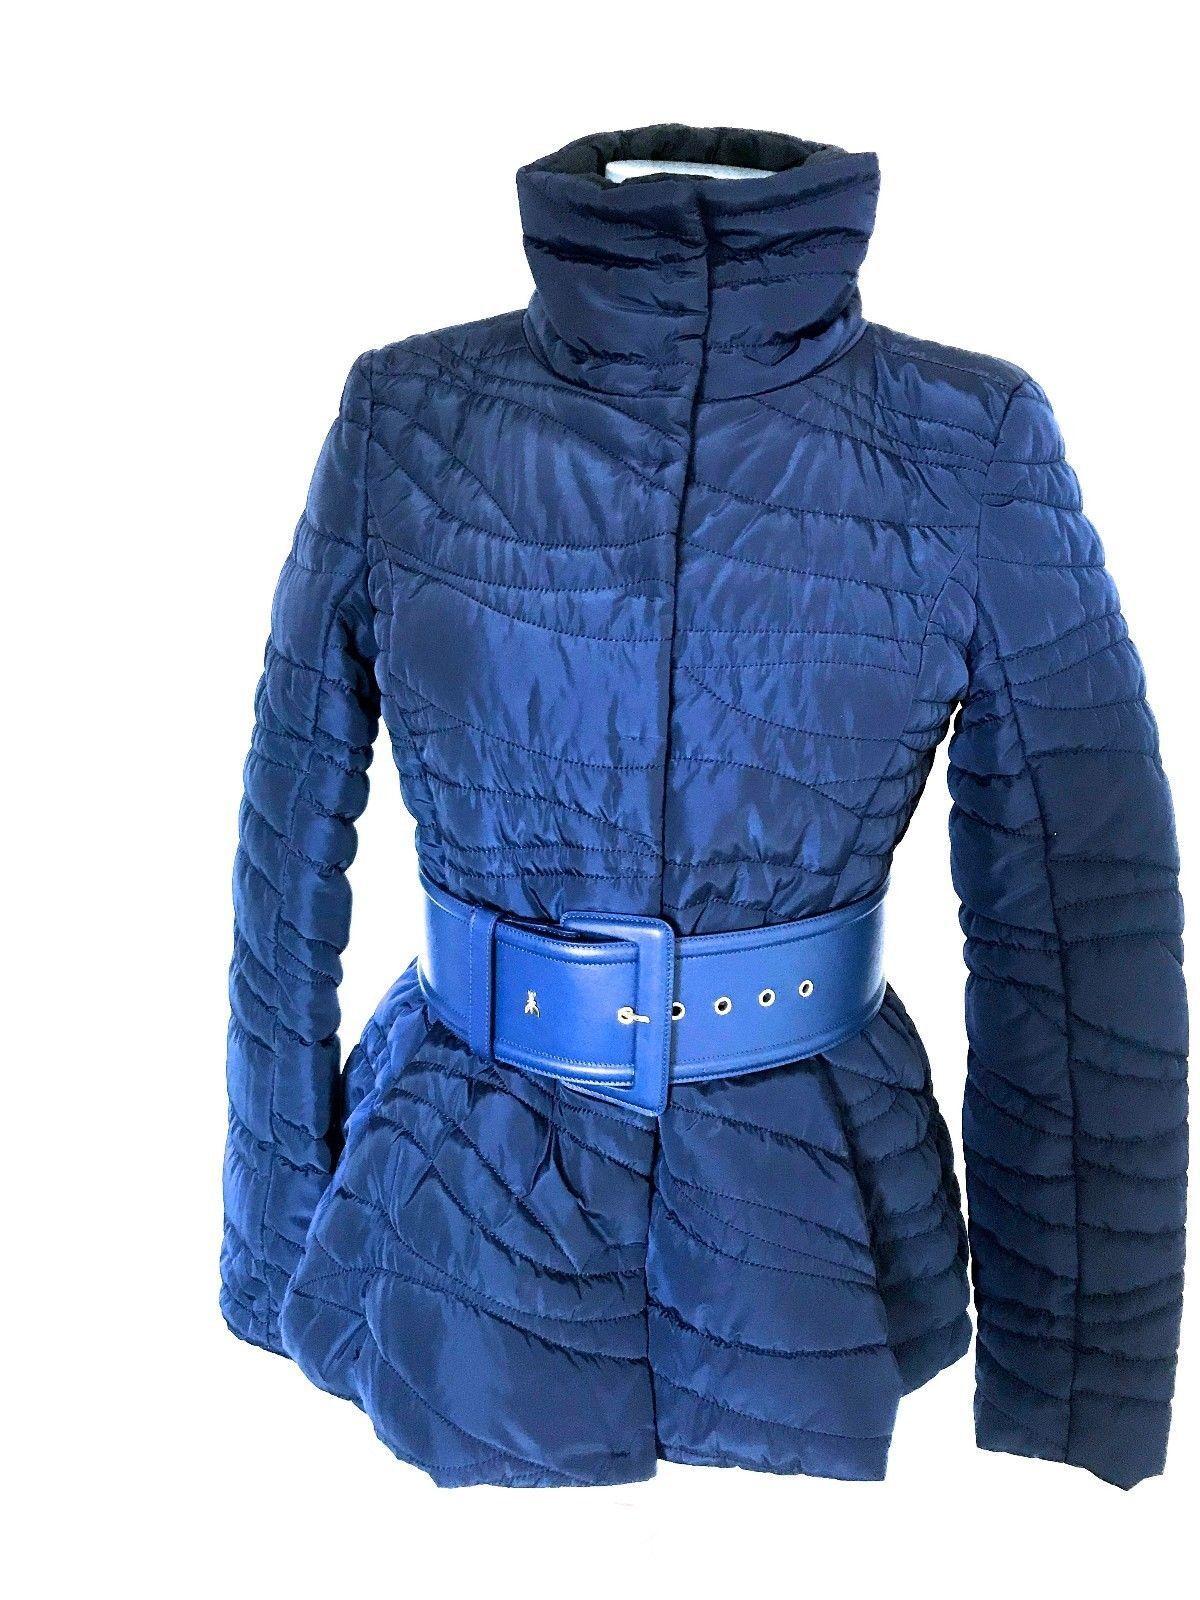 Patrizia Pepe chaqueta chaqueta inflexión chaqueta talla  34 it 40; 36 it 42  autentico en linea